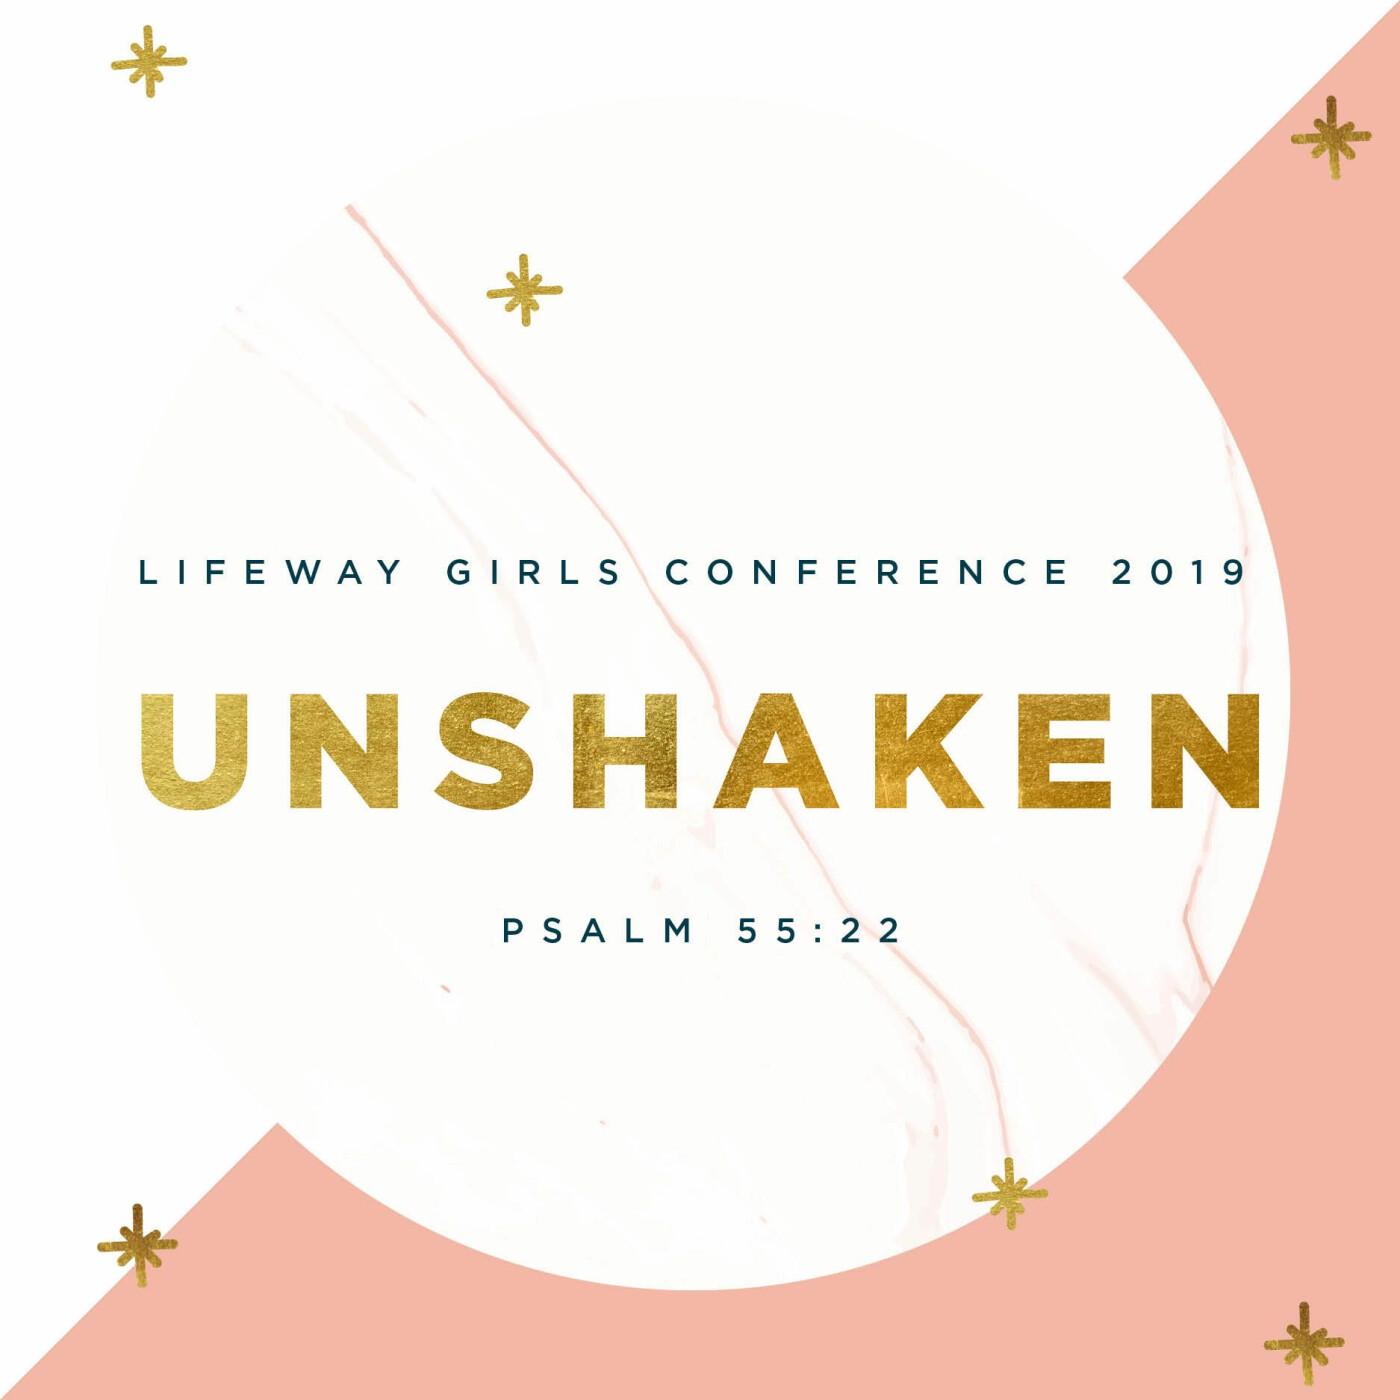 LifeWay Girls Conference